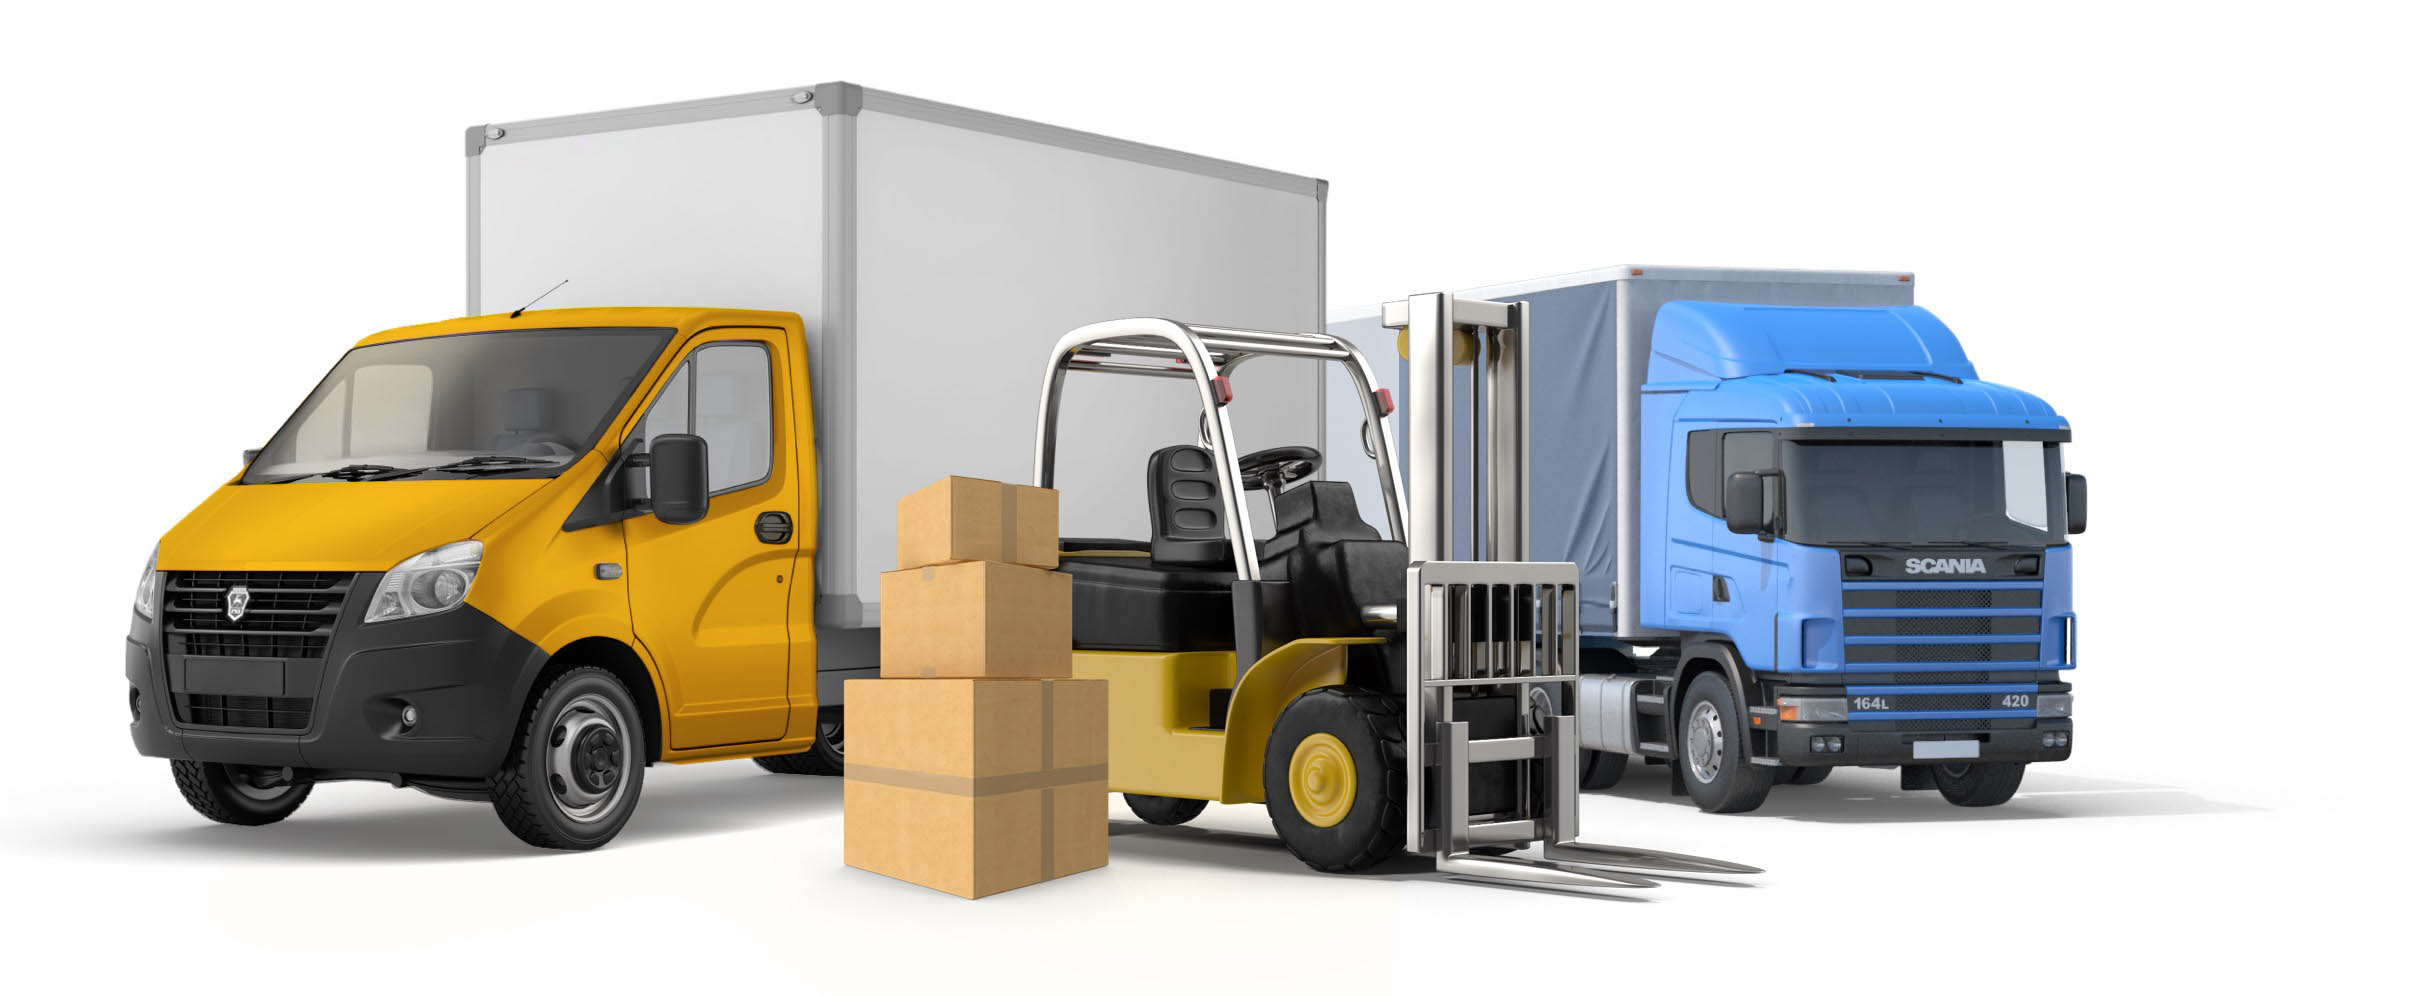 Картинки по запросу Логистические услуги от компании «Profi Cargo Service»